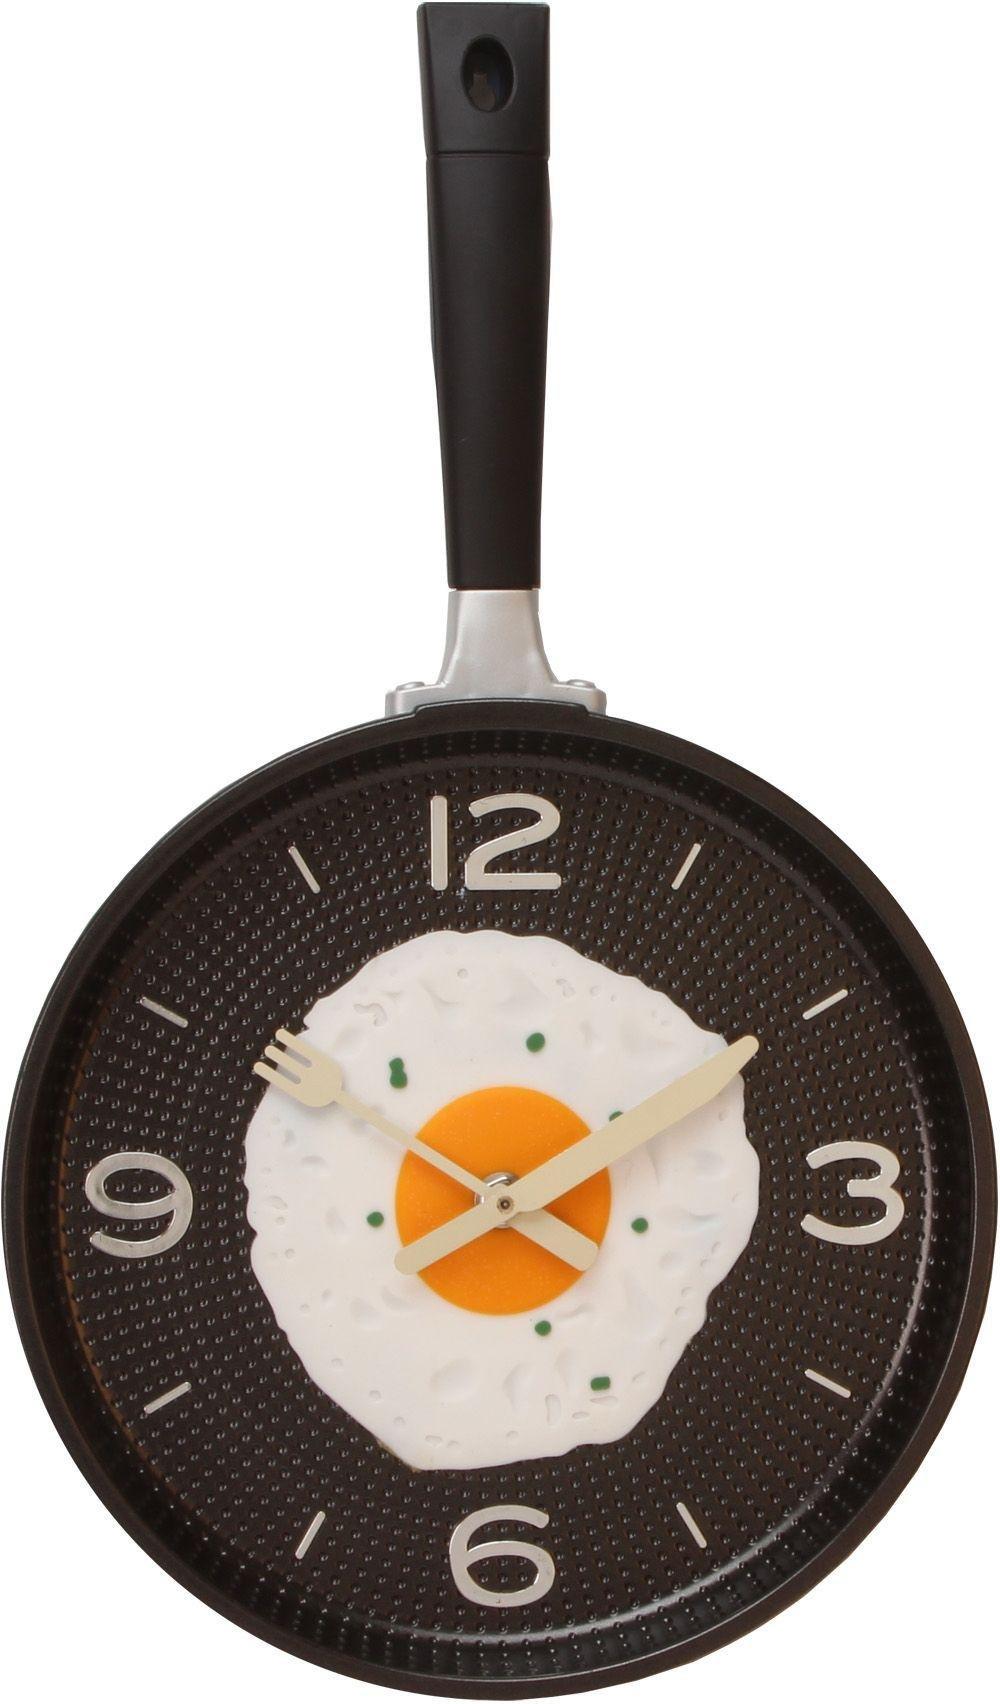 argos clocks sale wall mantel carriage digital radio alarm kids cl. Black Bedroom Furniture Sets. Home Design Ideas